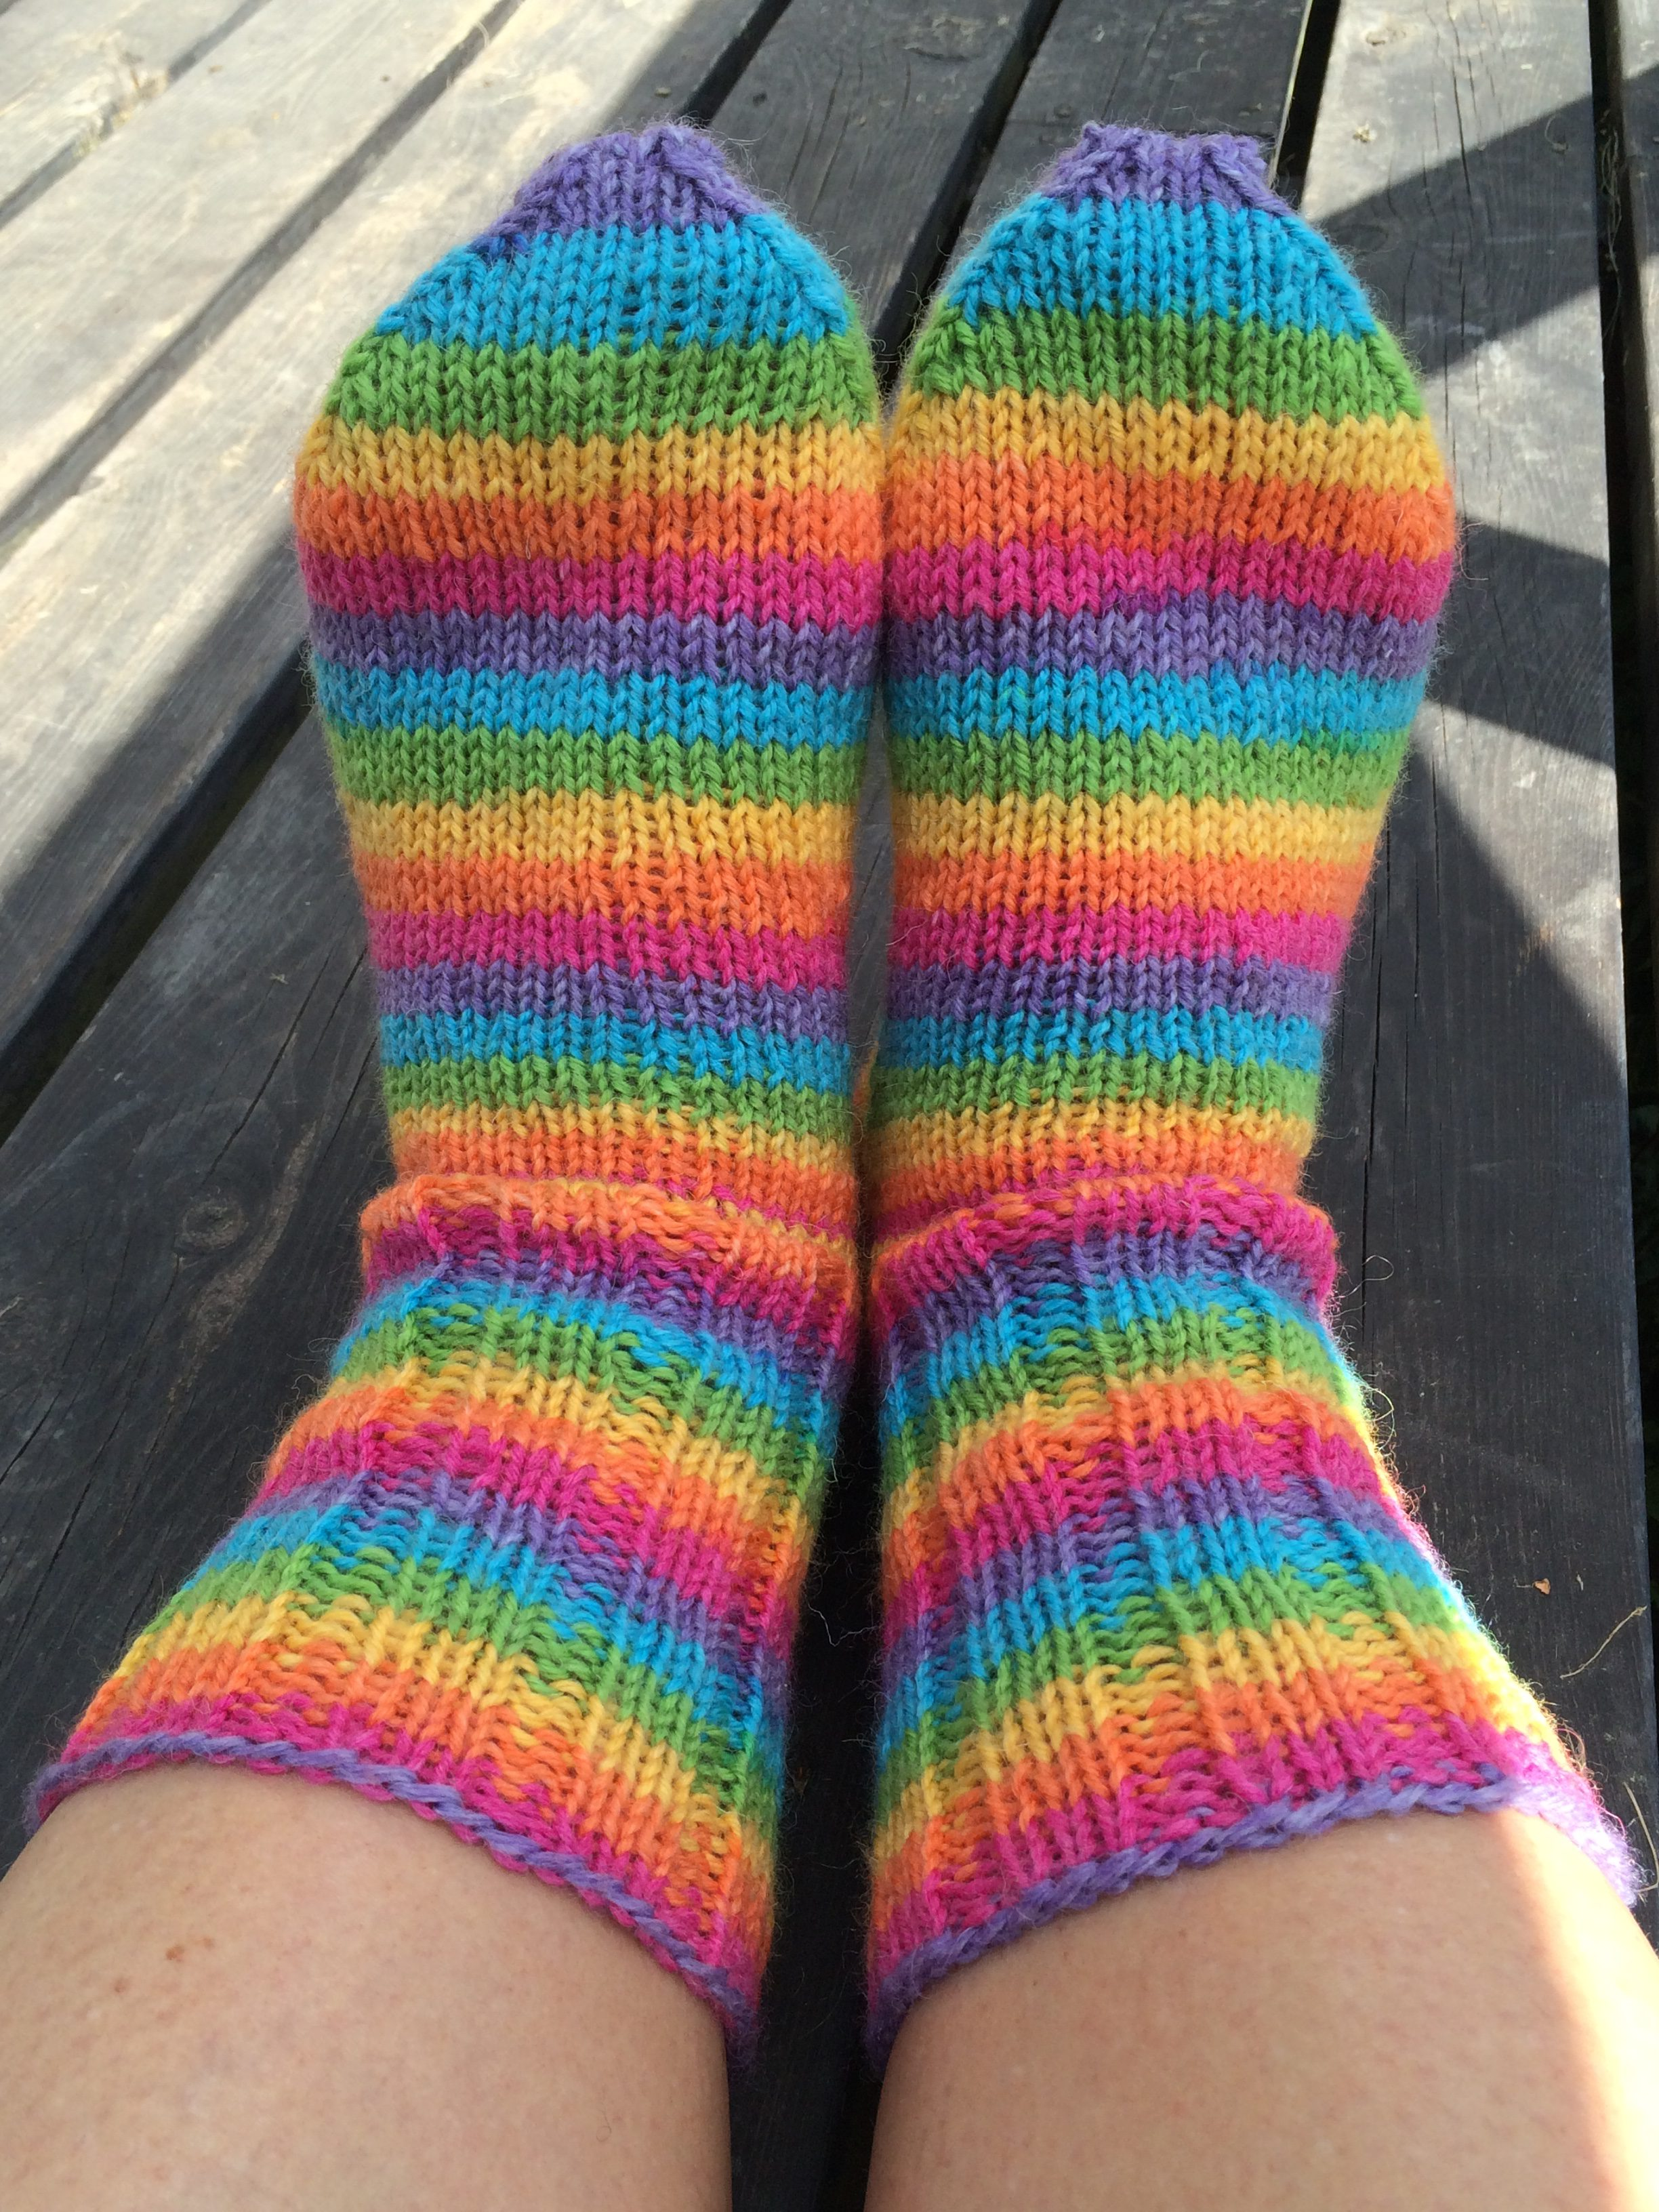 Regnbågssockor på foten